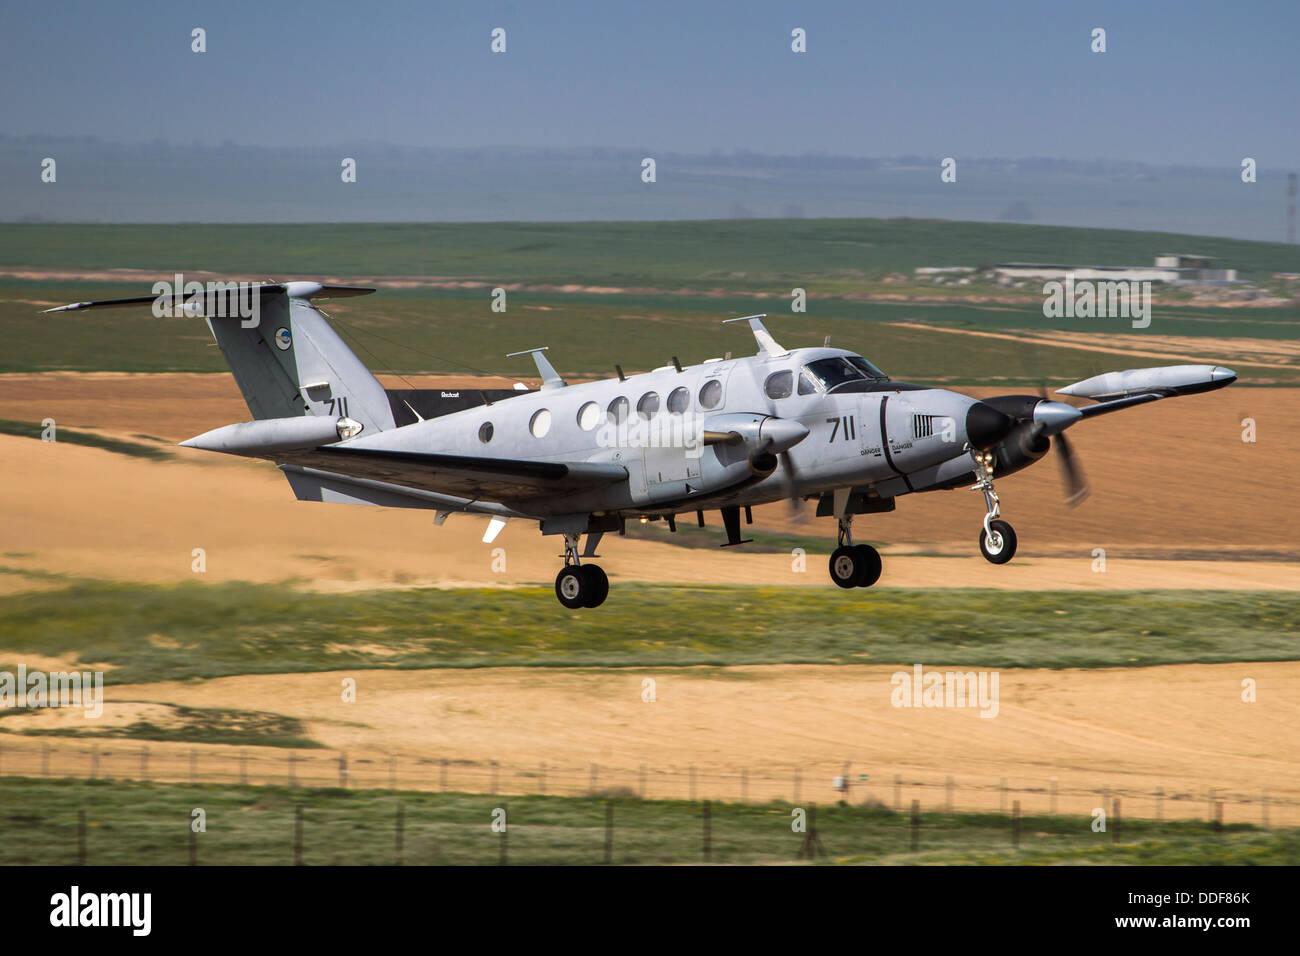 Israeli Air force (IAF) Beechcraft King Air twin-turboprop aircraft - Stock Image